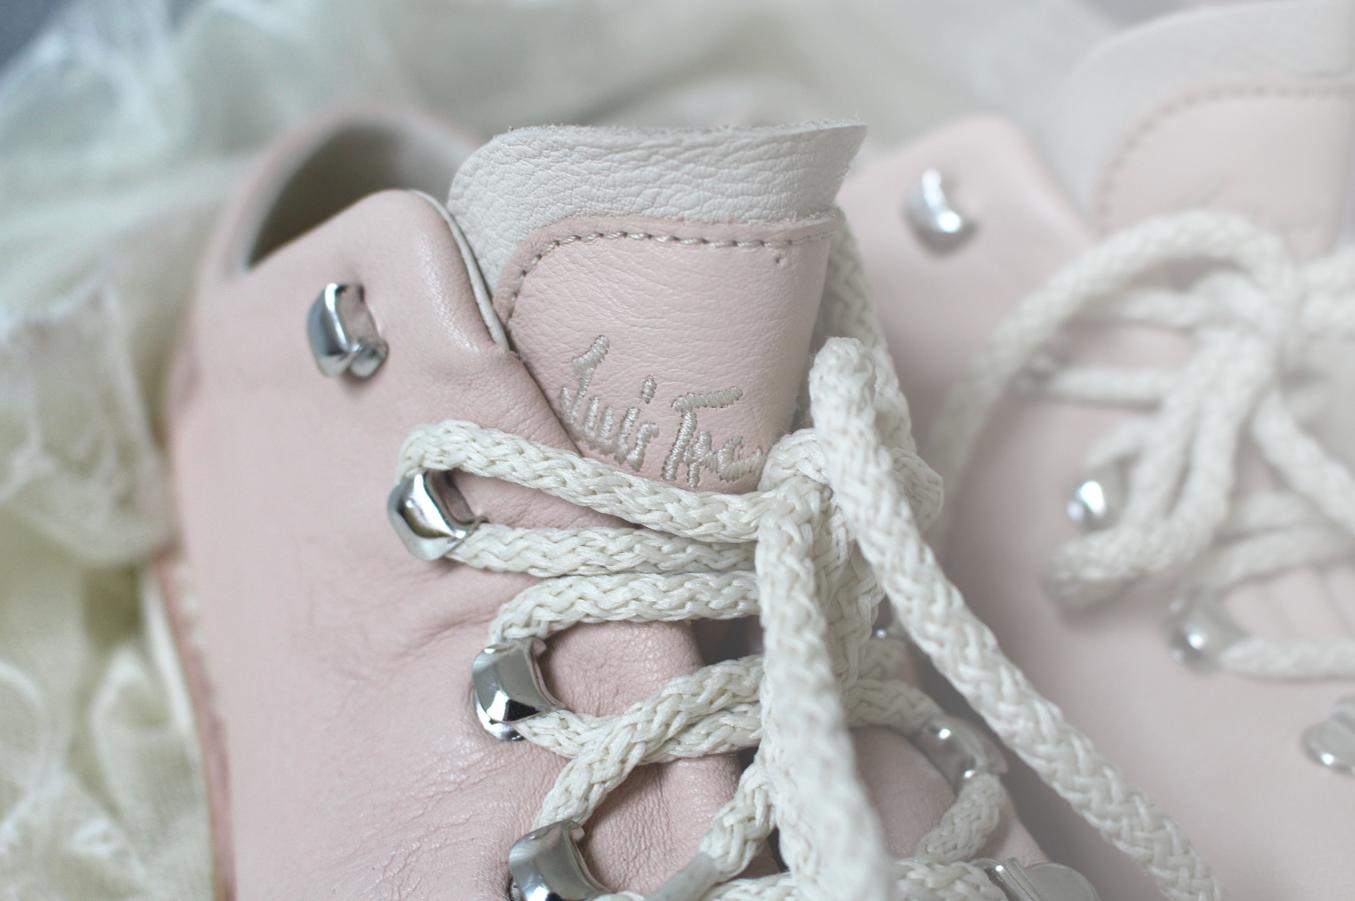 maybeyoulike_wedding_shoes_4